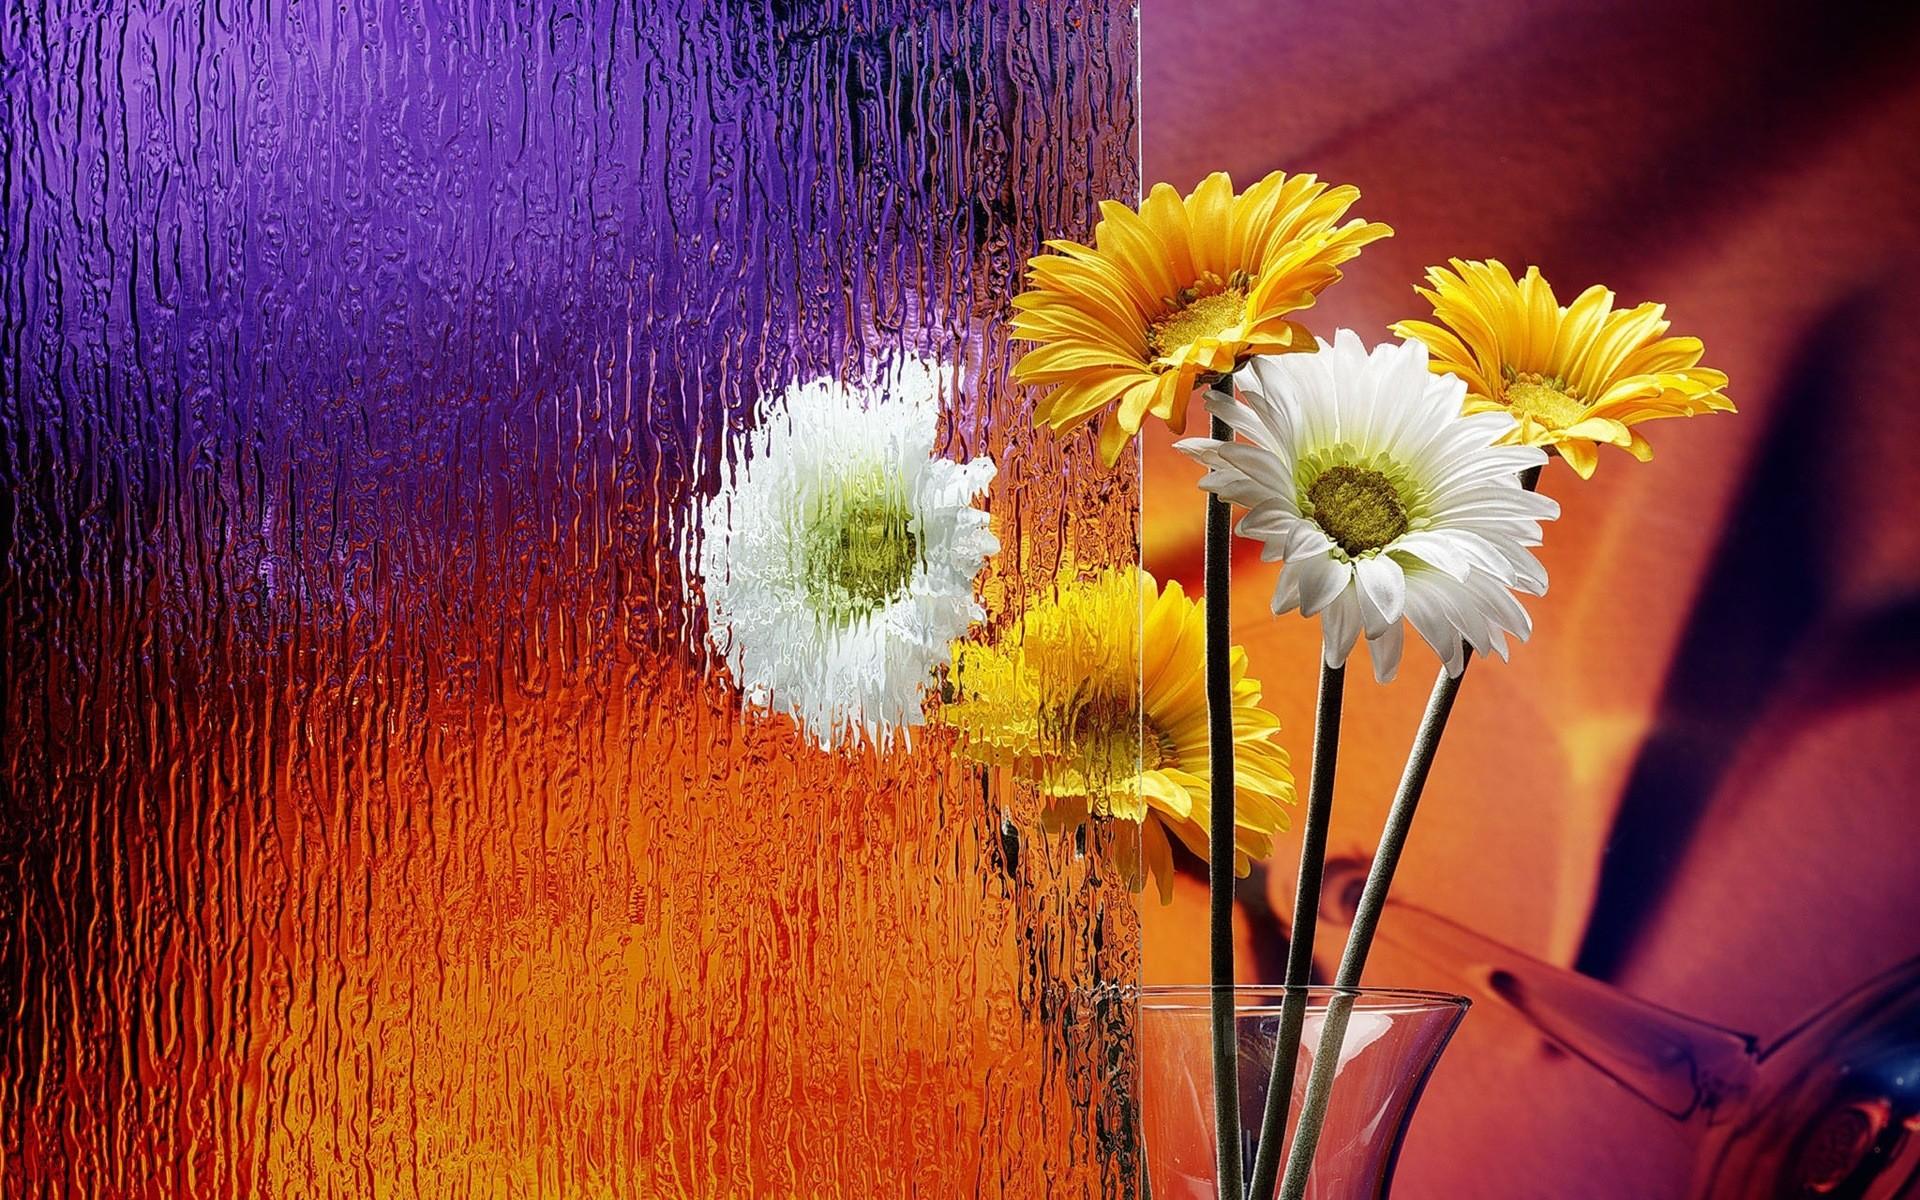 34 Hd Wallpaper For Desktop   Gallery of Backgrounds Free .